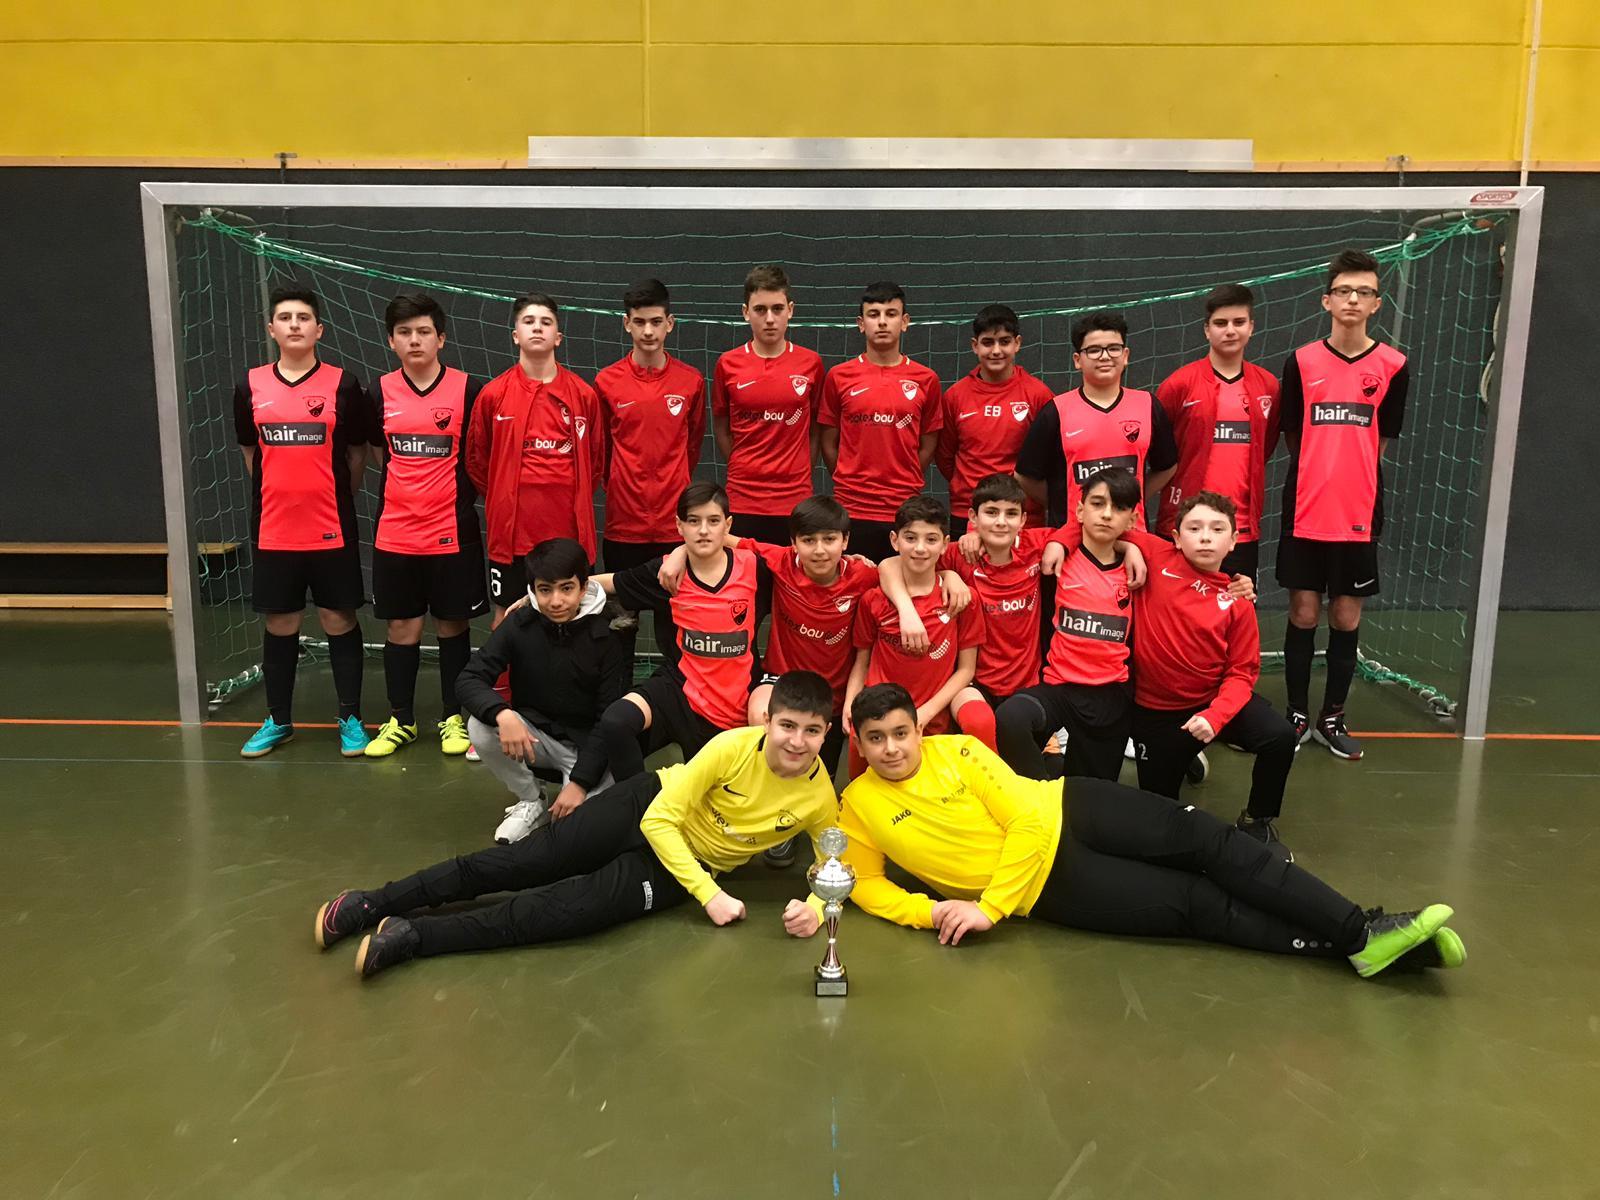 Cay Bau Cup C-Jugend Pokal geht an Ay-Yildizspor